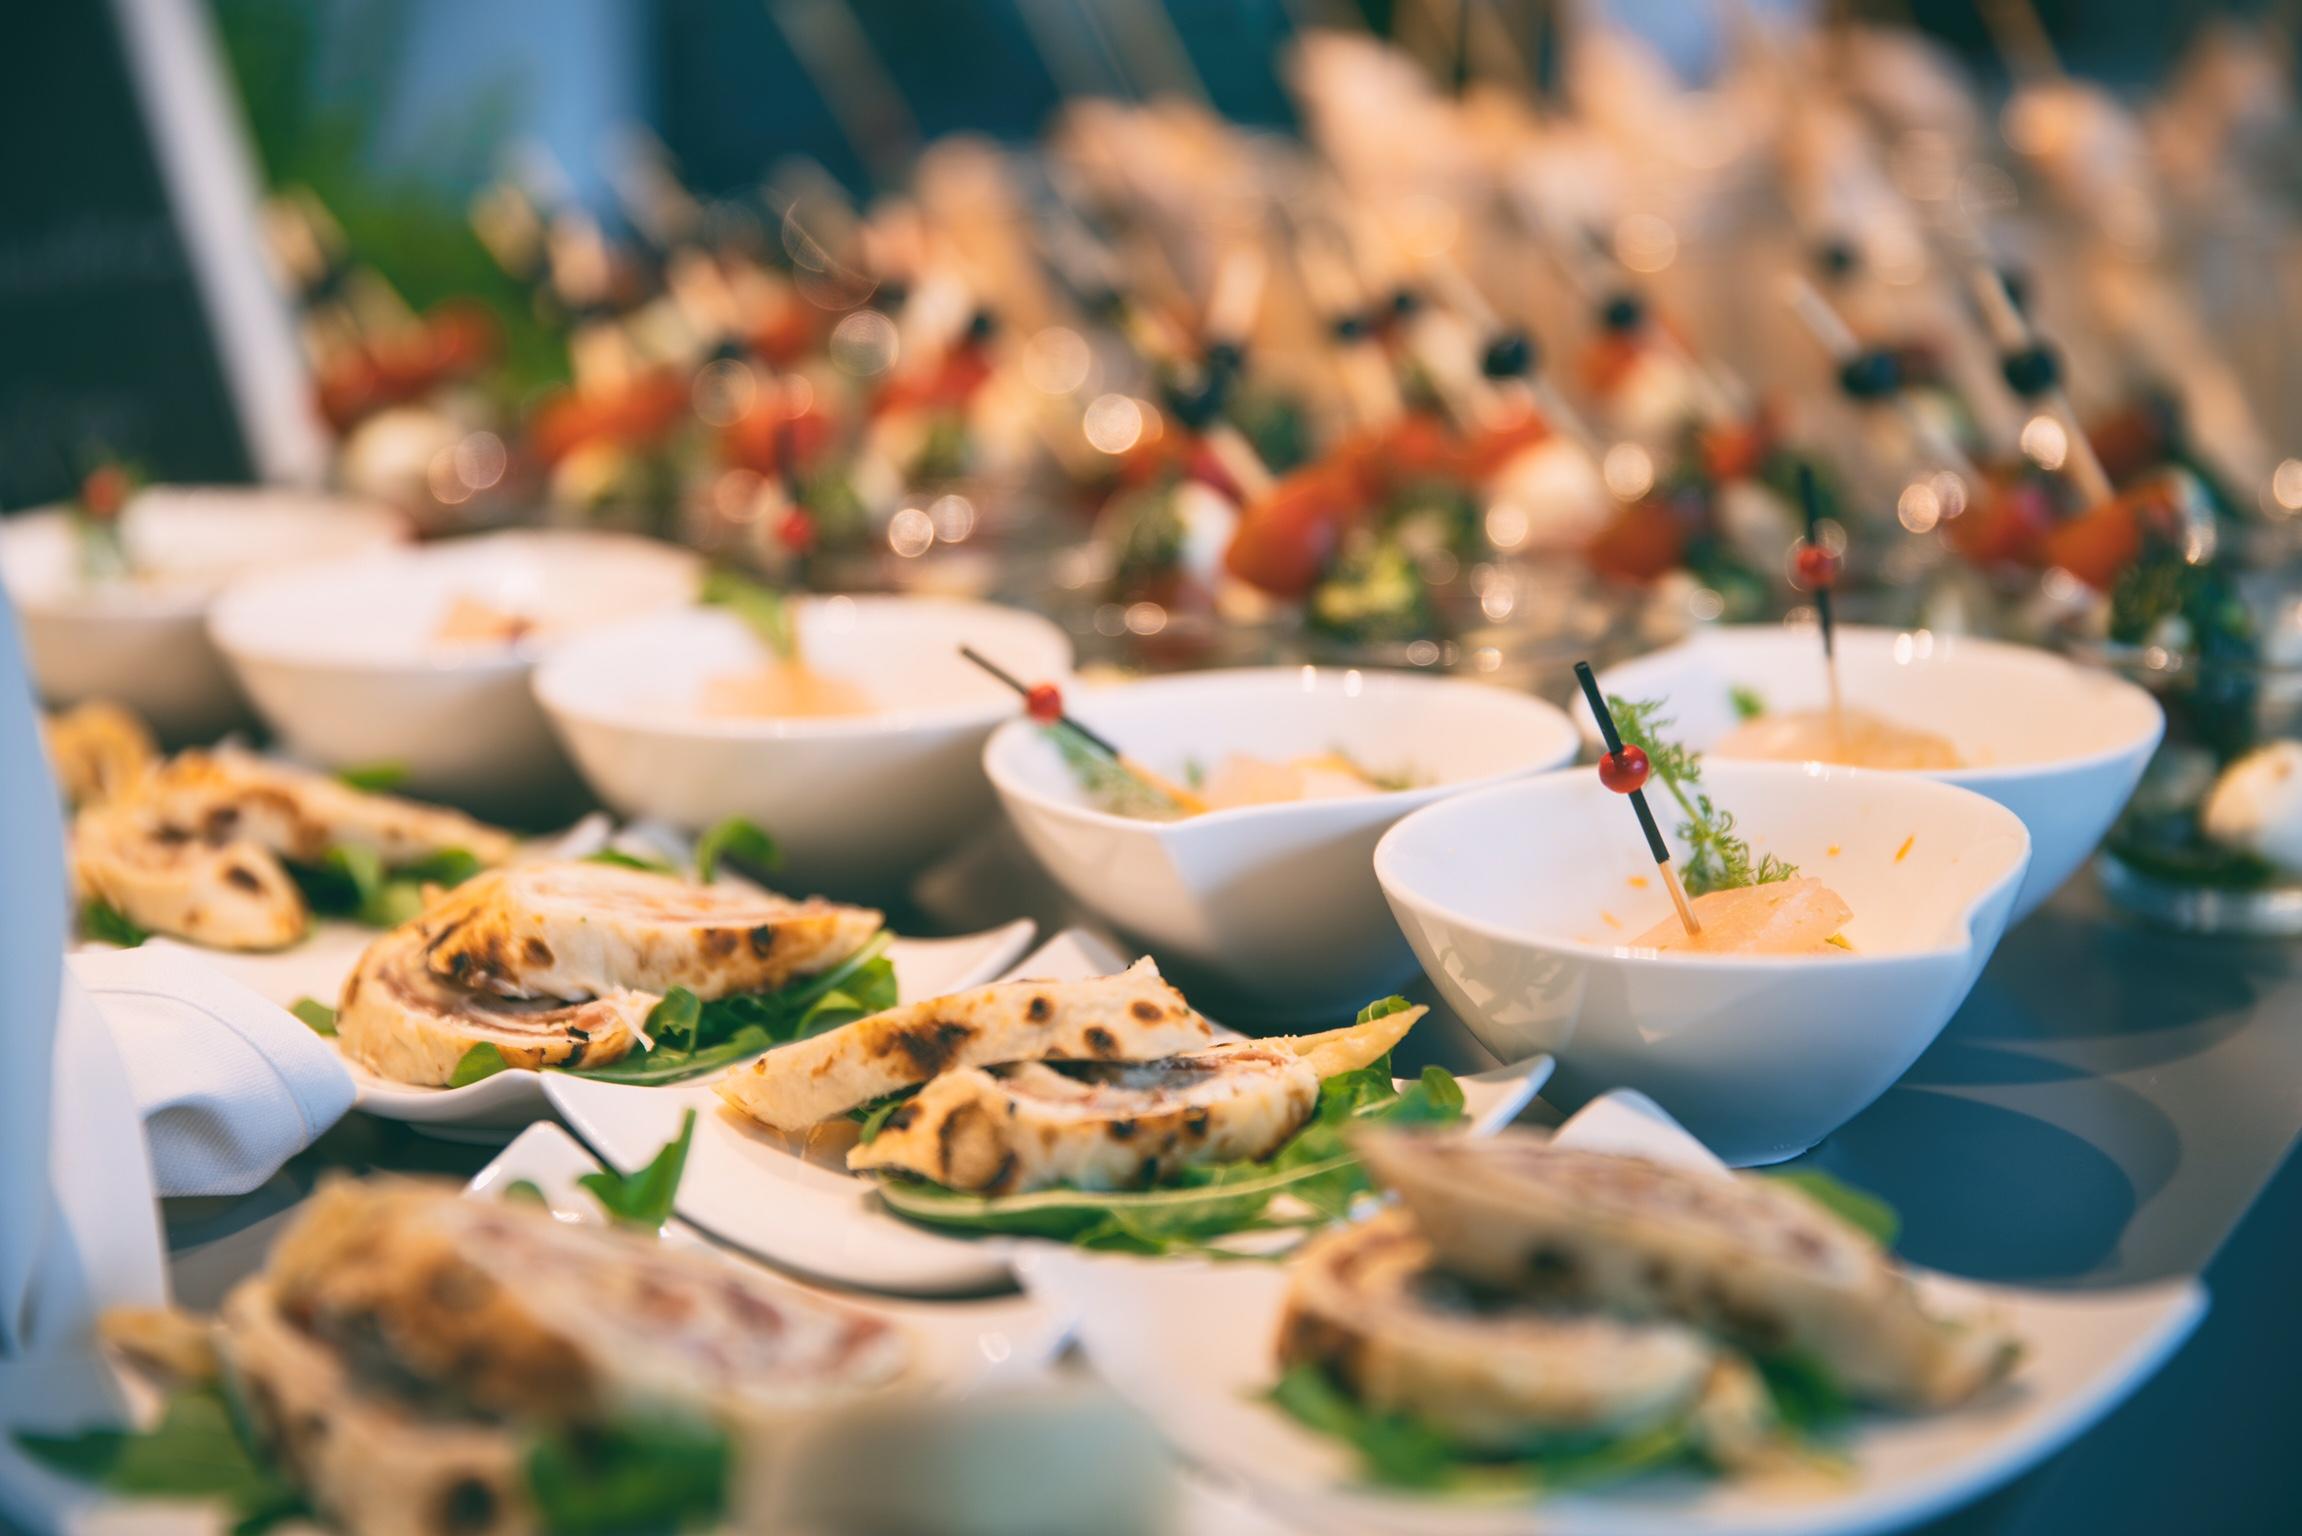 Privatveranstaltung Catering 30 Personen in Rheinbach